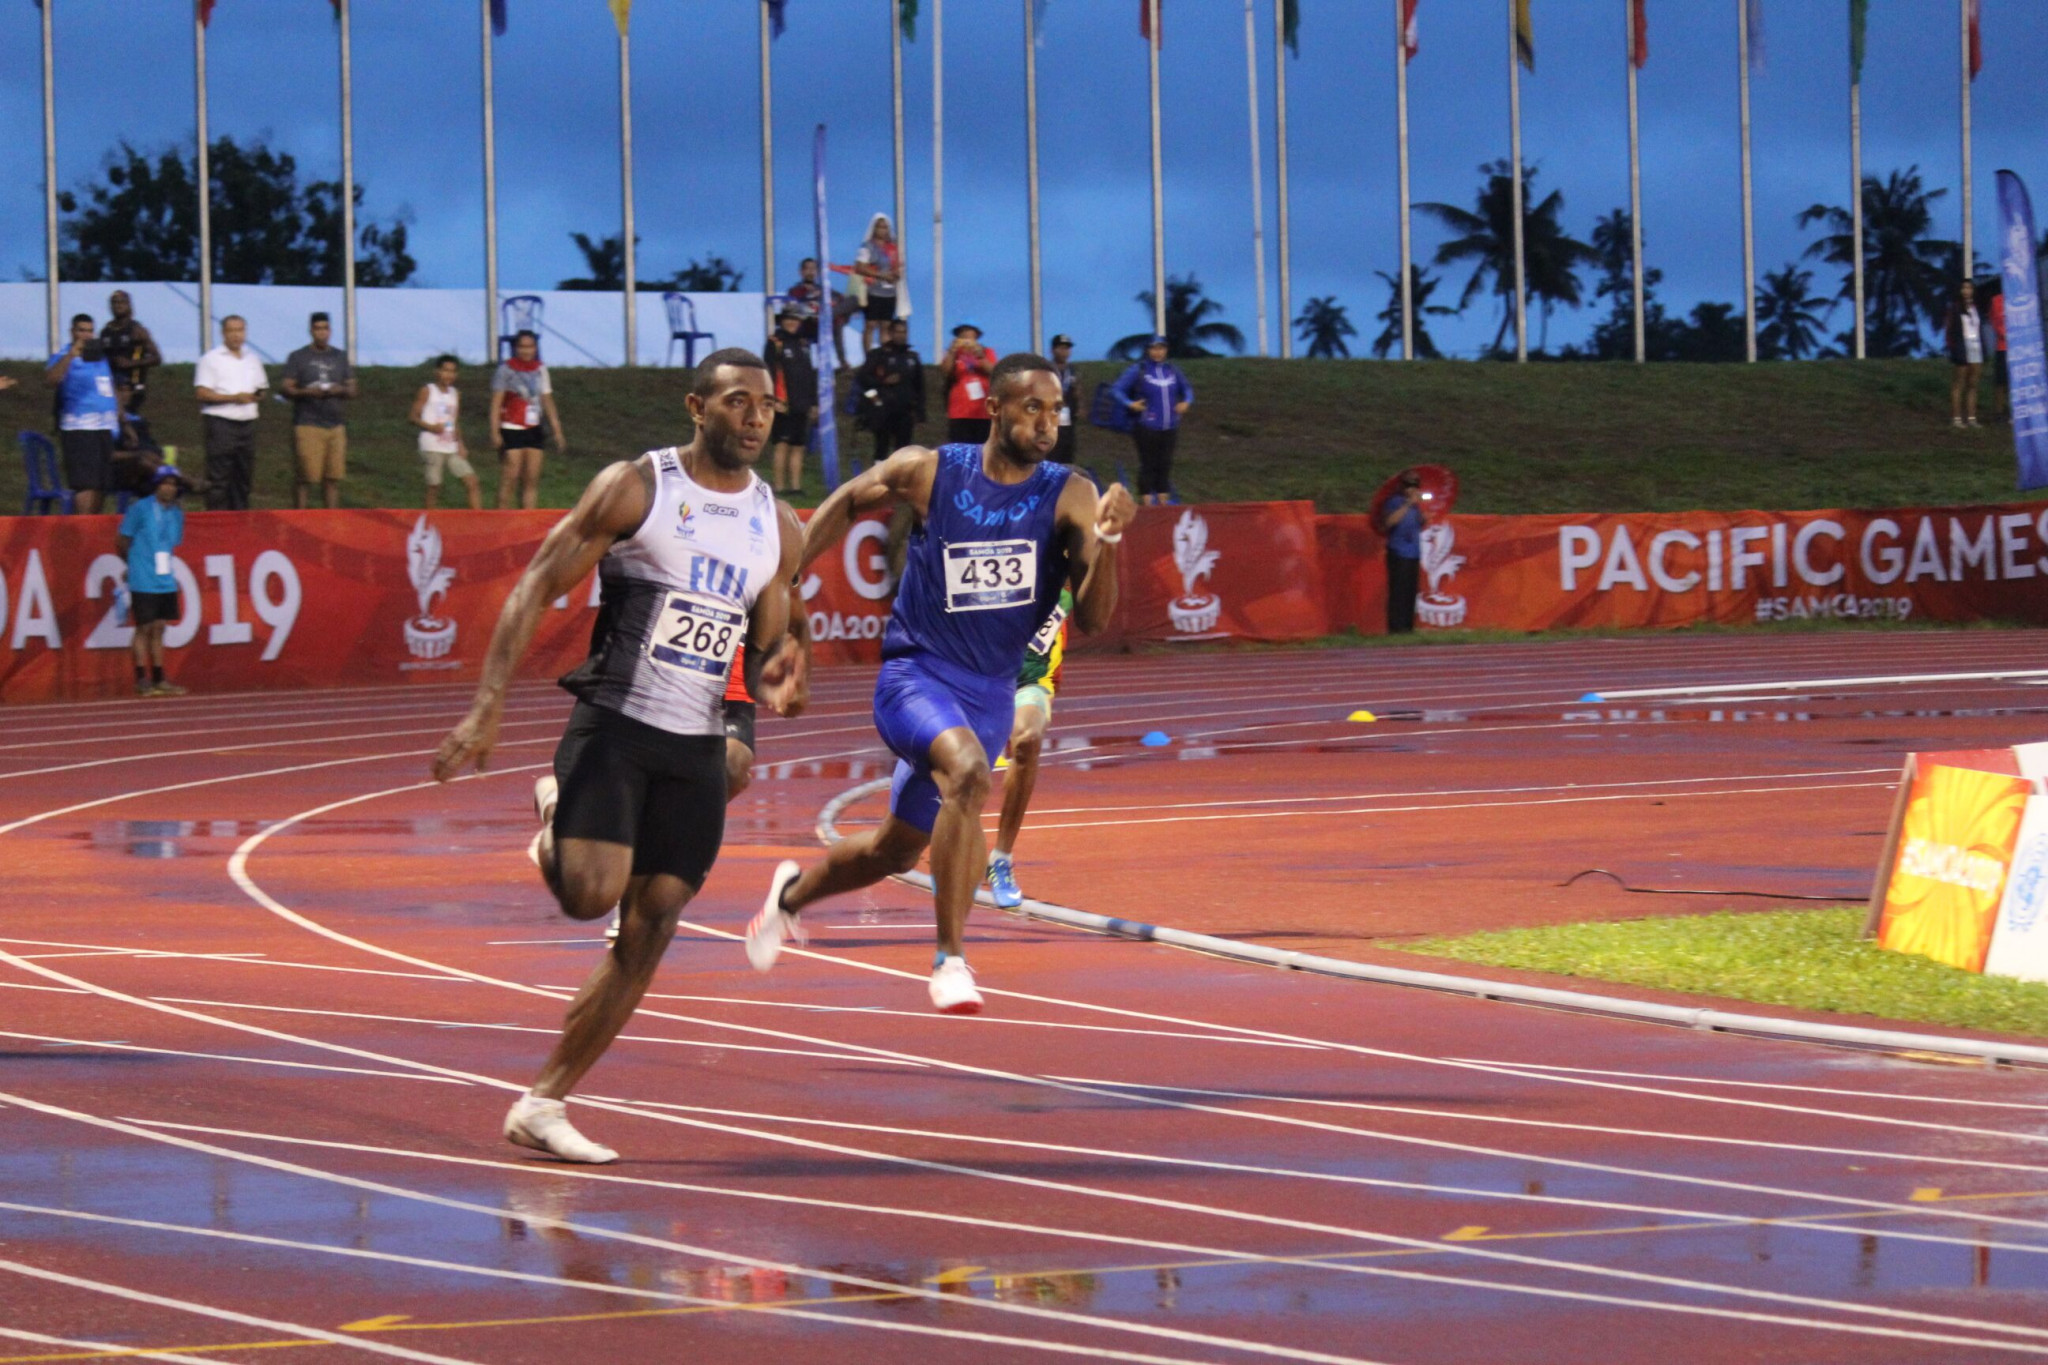 Fiji's Banuve Tabakaucoro won the men's 200m after a brilliant race with Samoa's Jeremy Dodson ©Samoa 2019